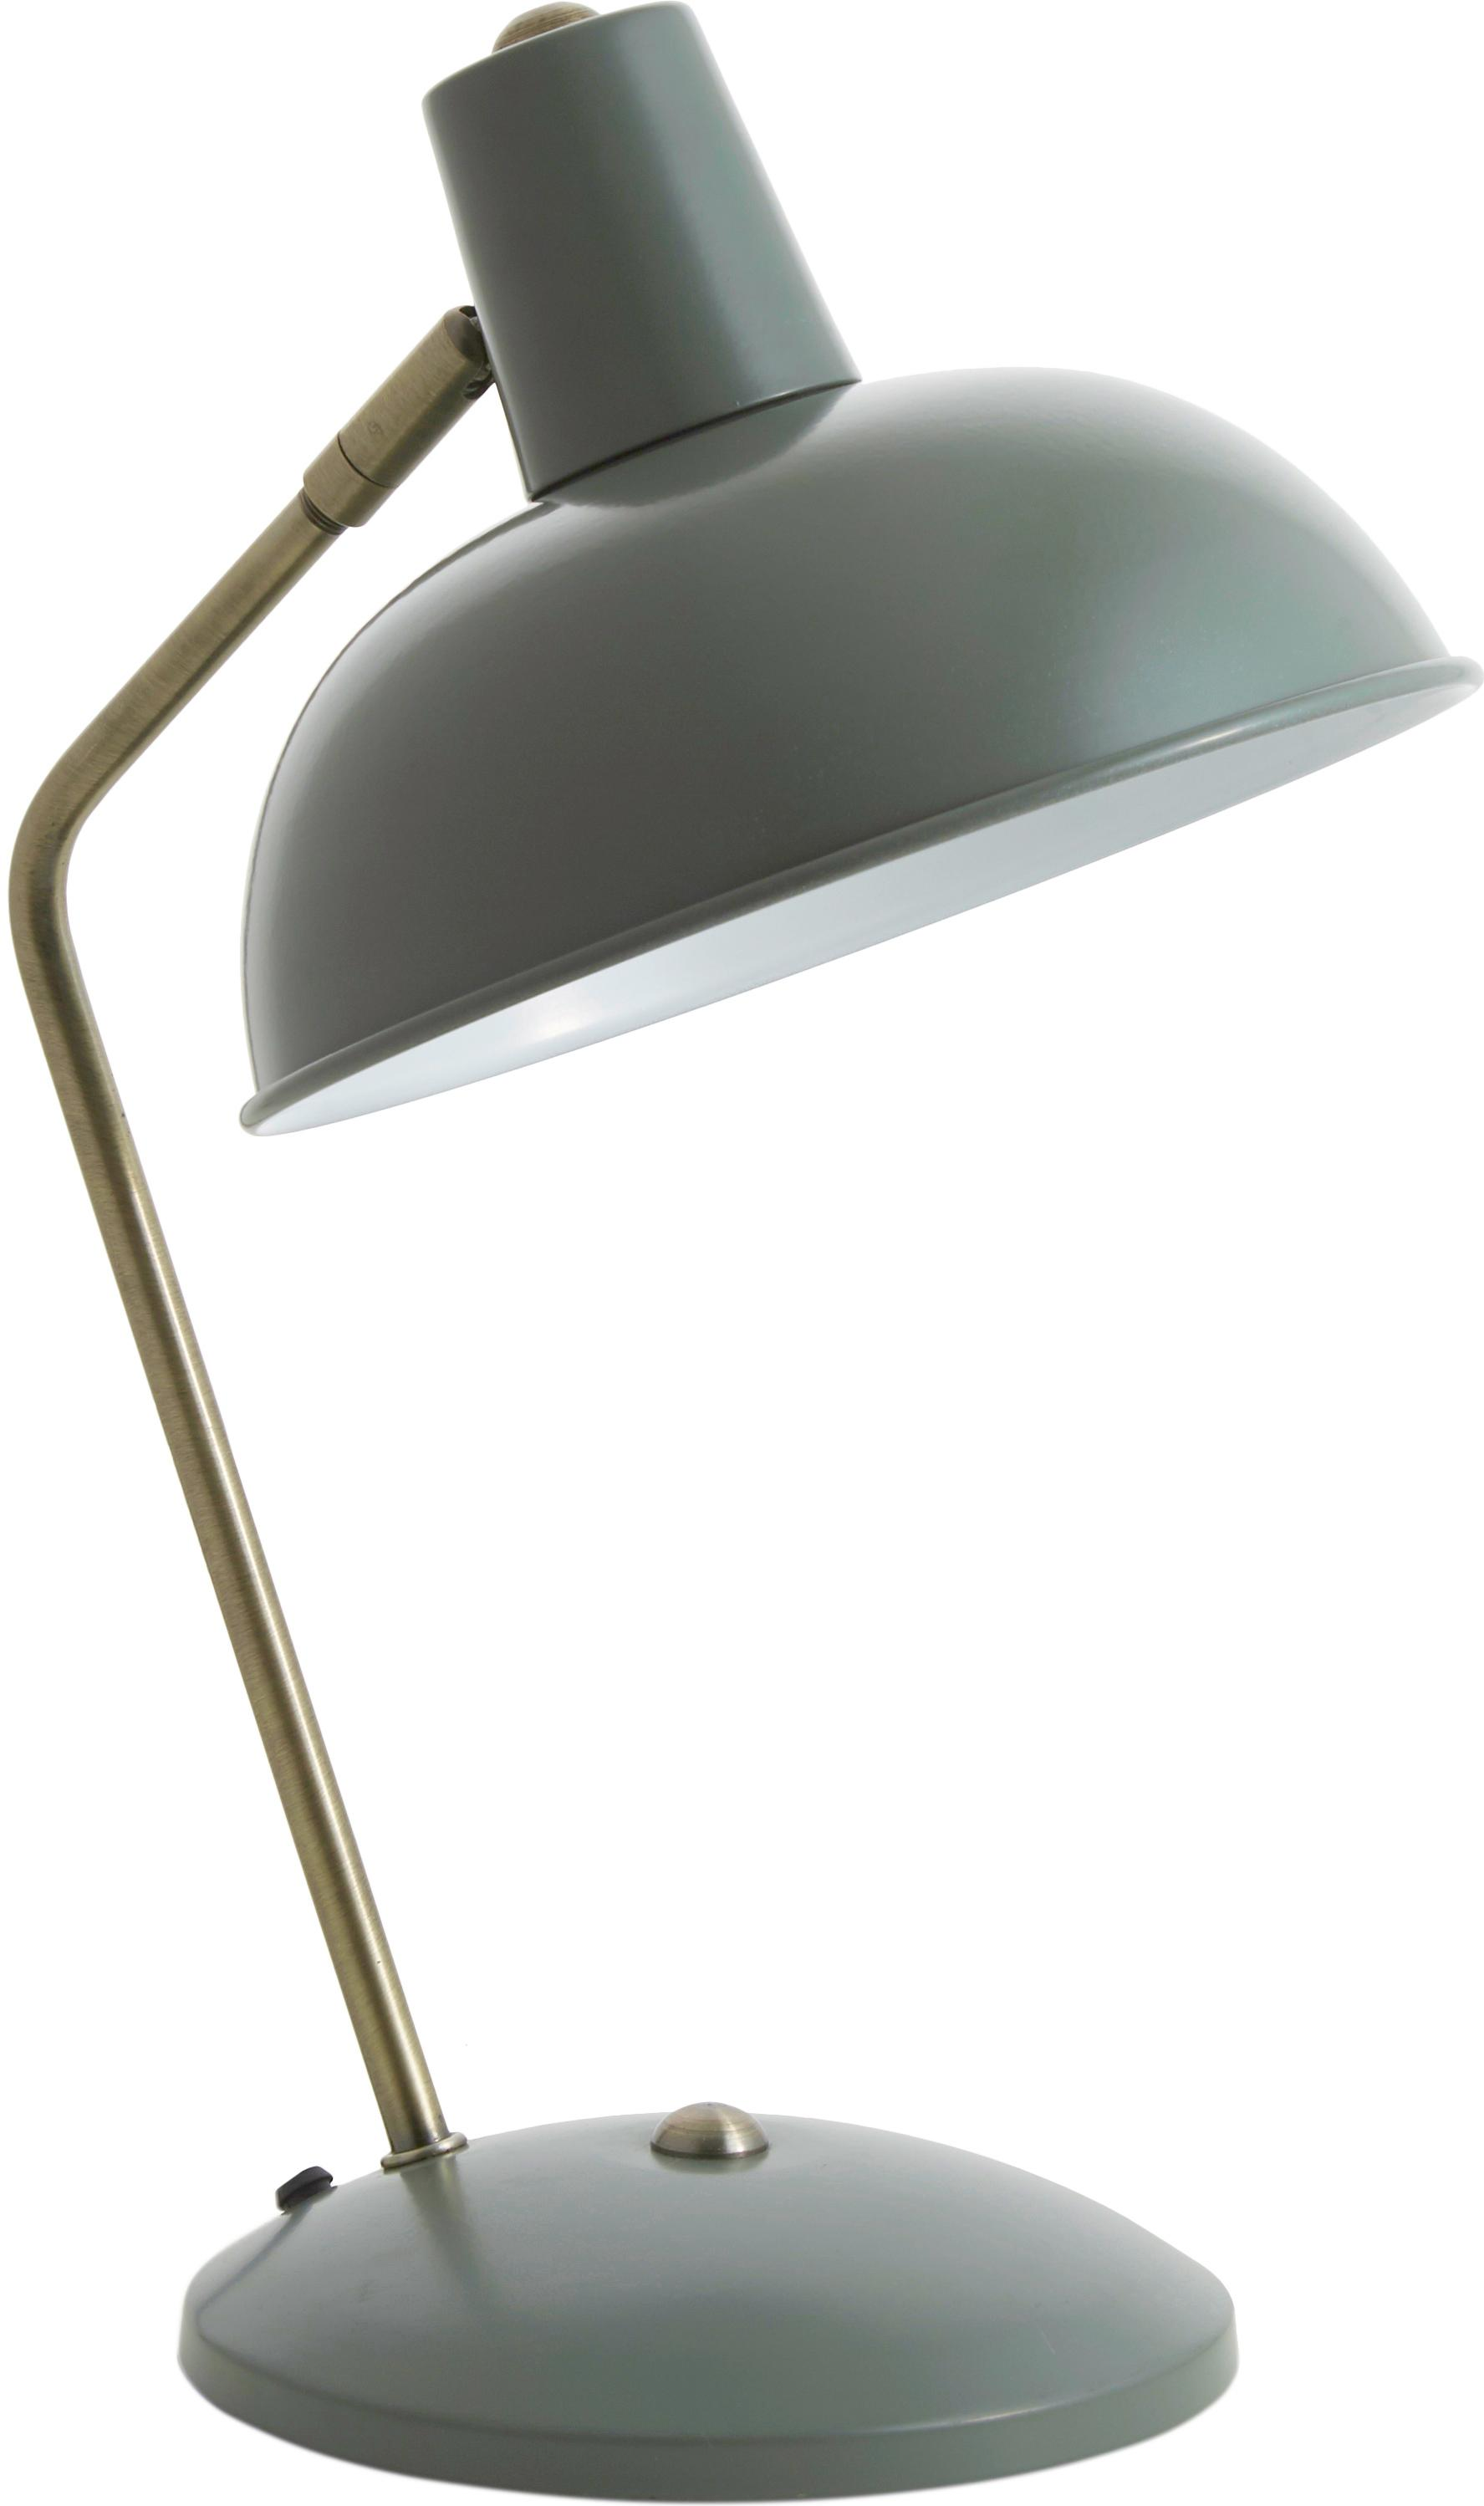 Retro-Schreibtischlampe Hood, Lampenschirm: Metall, lackiert, Leuchte: Grün, Messingfarben<br>Lampenschirm innen: Weiss, 20 x 38 cm